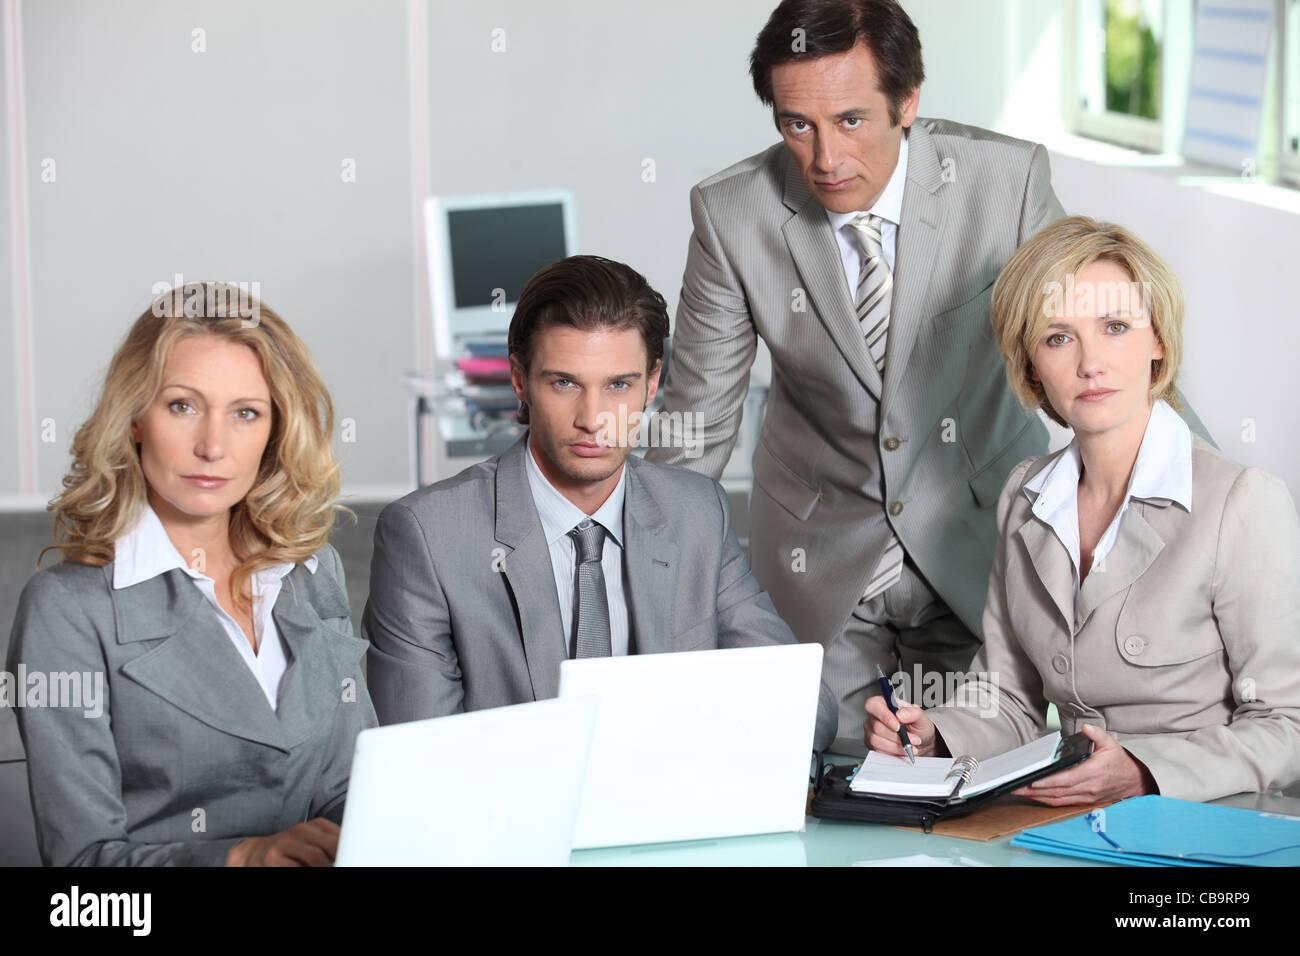 Serious team of executives - Stock Image